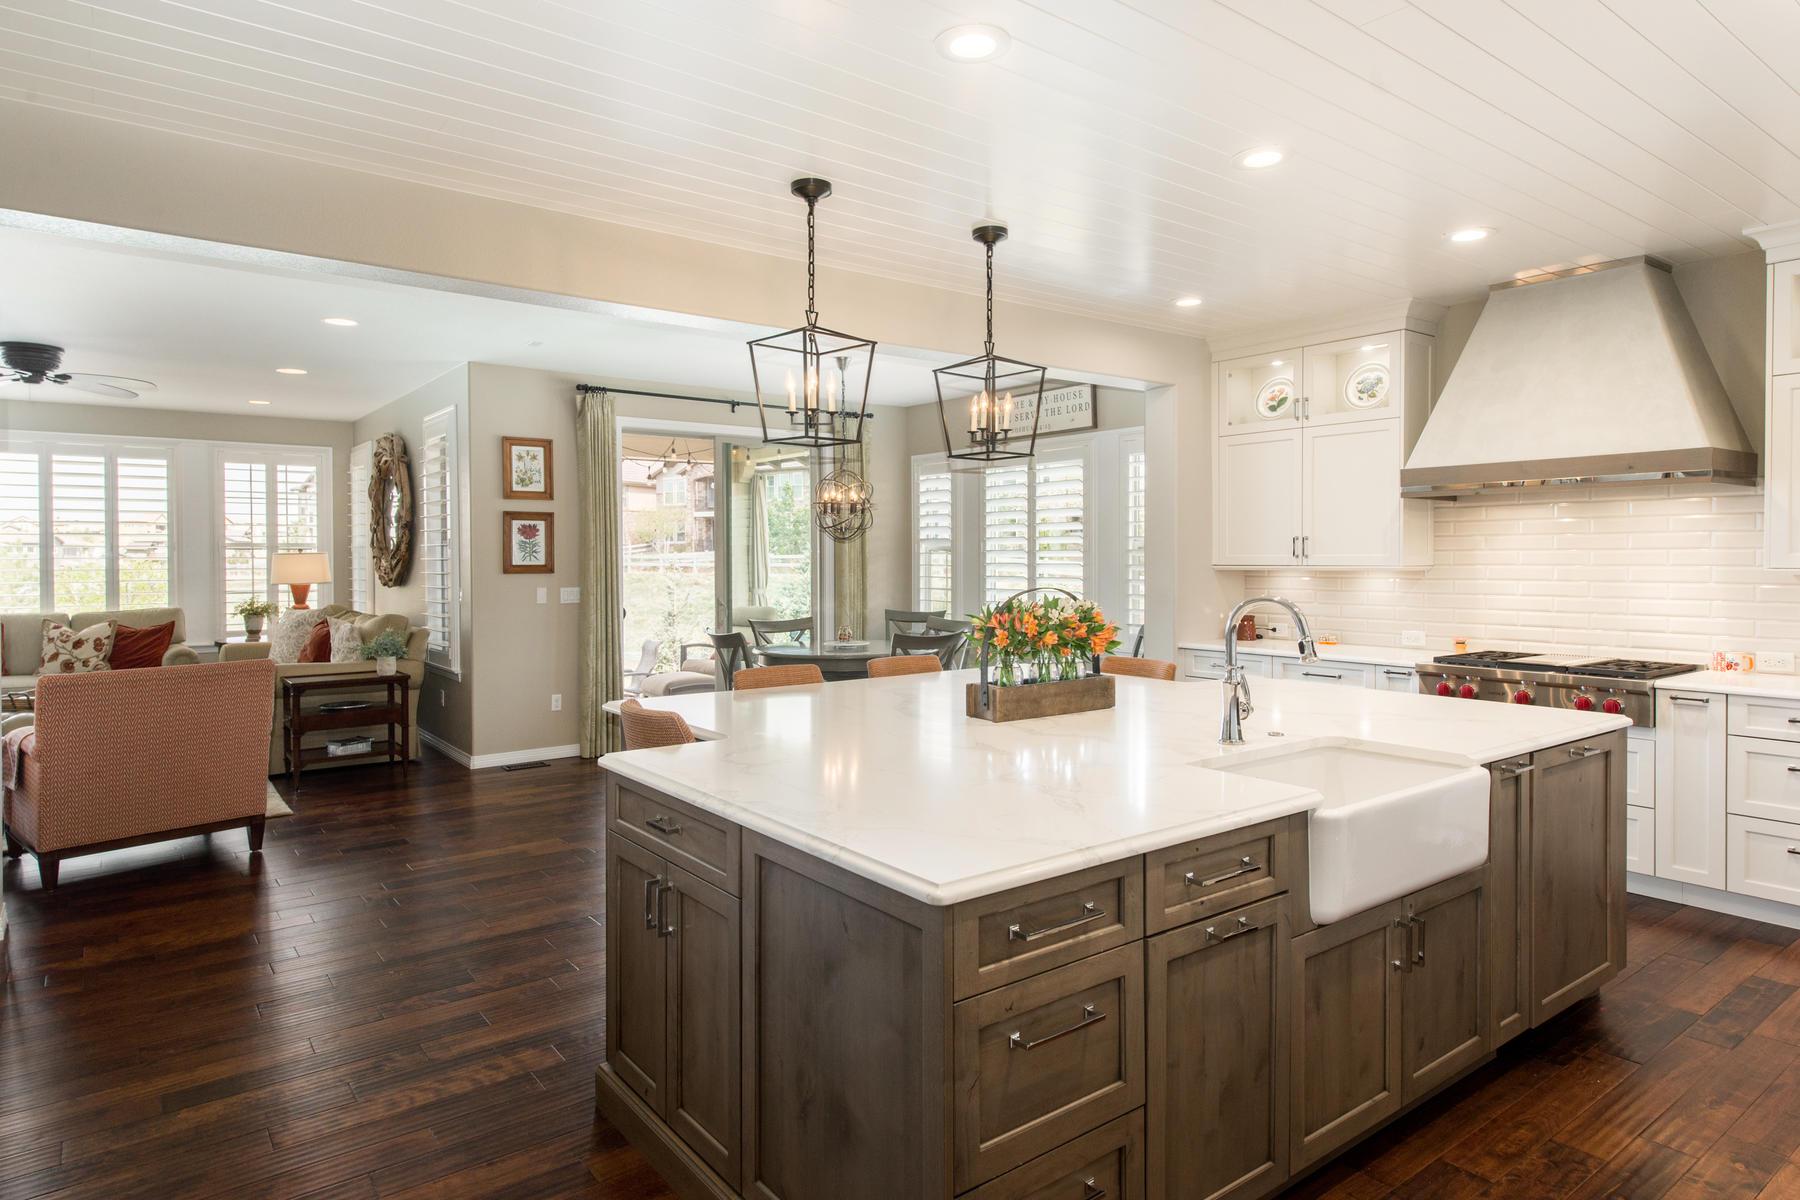 Casa Unifamiliar por un Venta en Impeccably Maintained & Beautifully Remodeled Home in Backcountry. 10702 Sundial Rim Rd Highlands Ranch, Colorado 80126 Estados Unidos